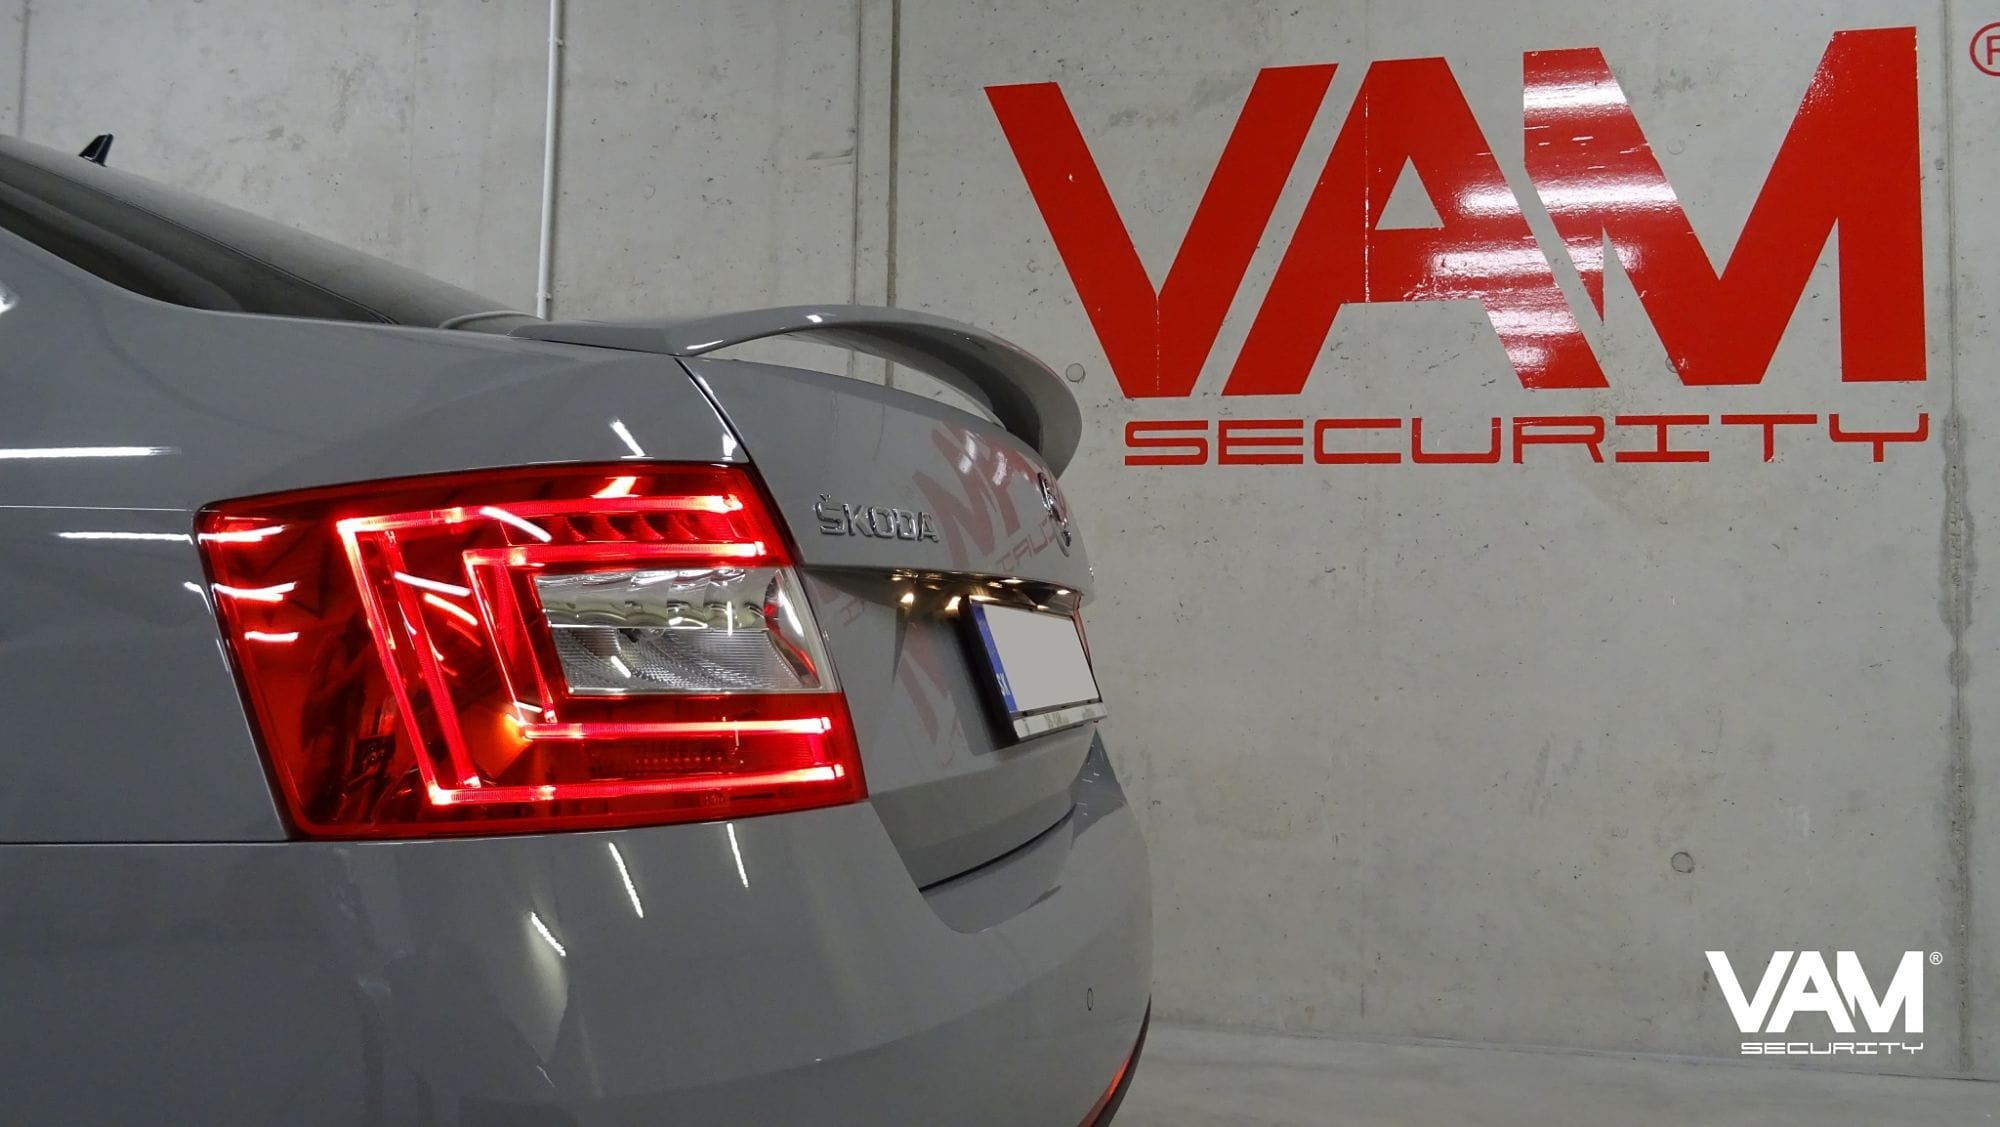 vam_security_octavia